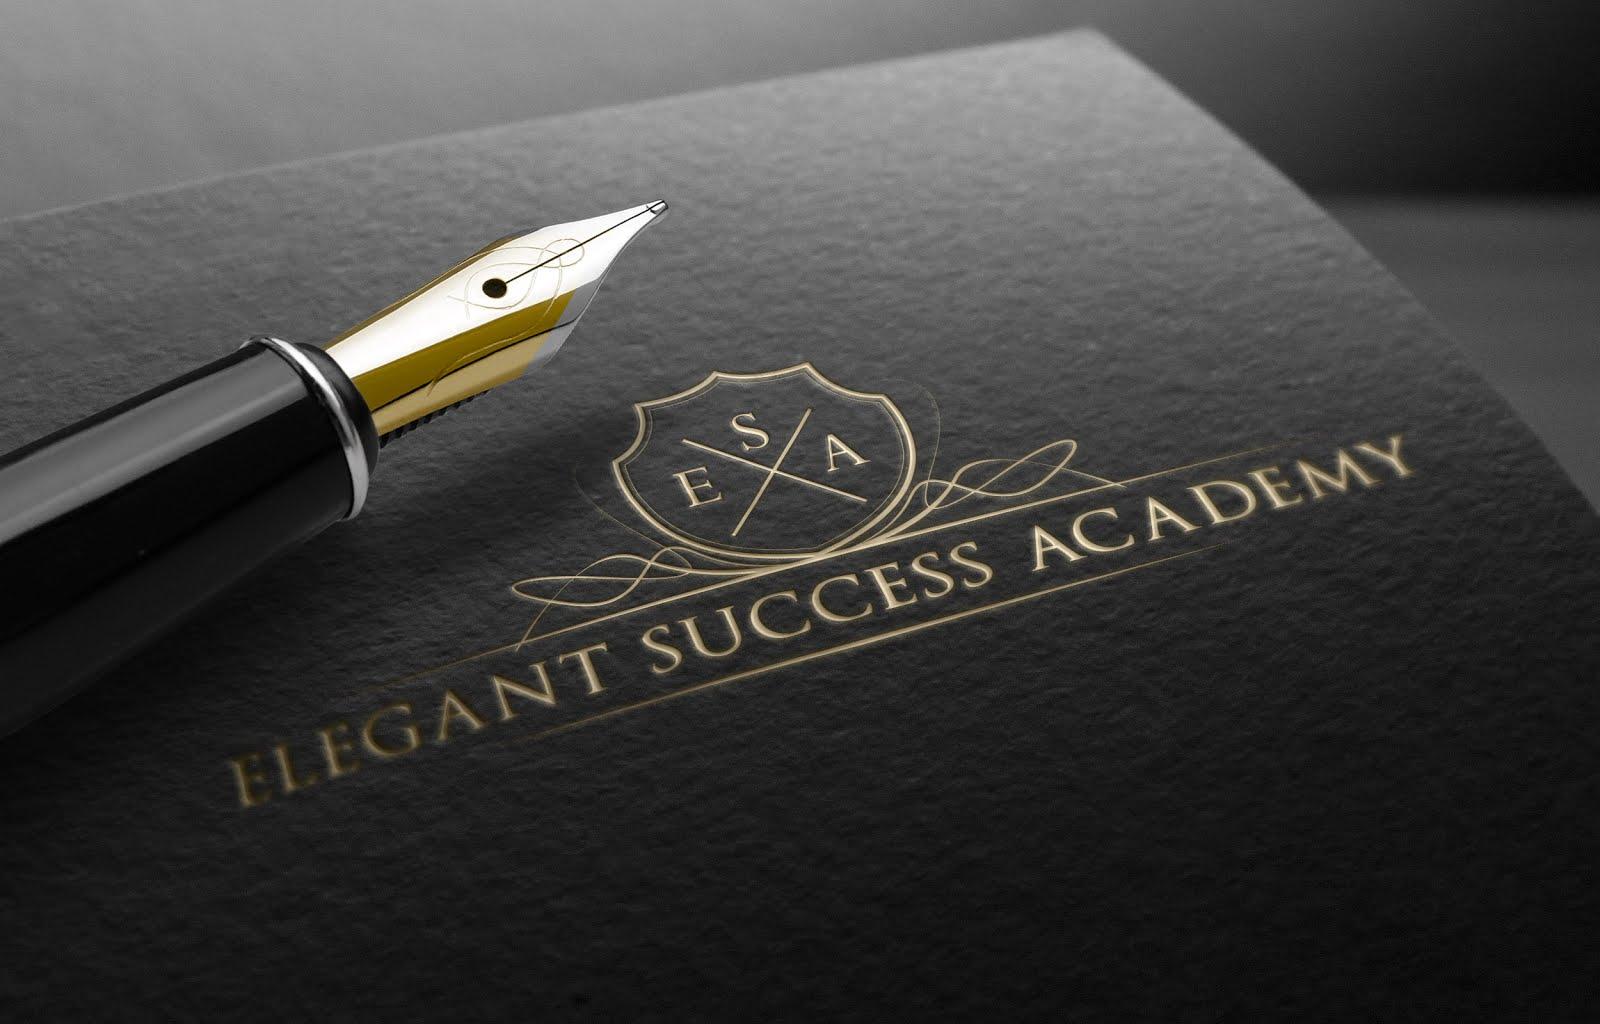 The Elegant Success Academy